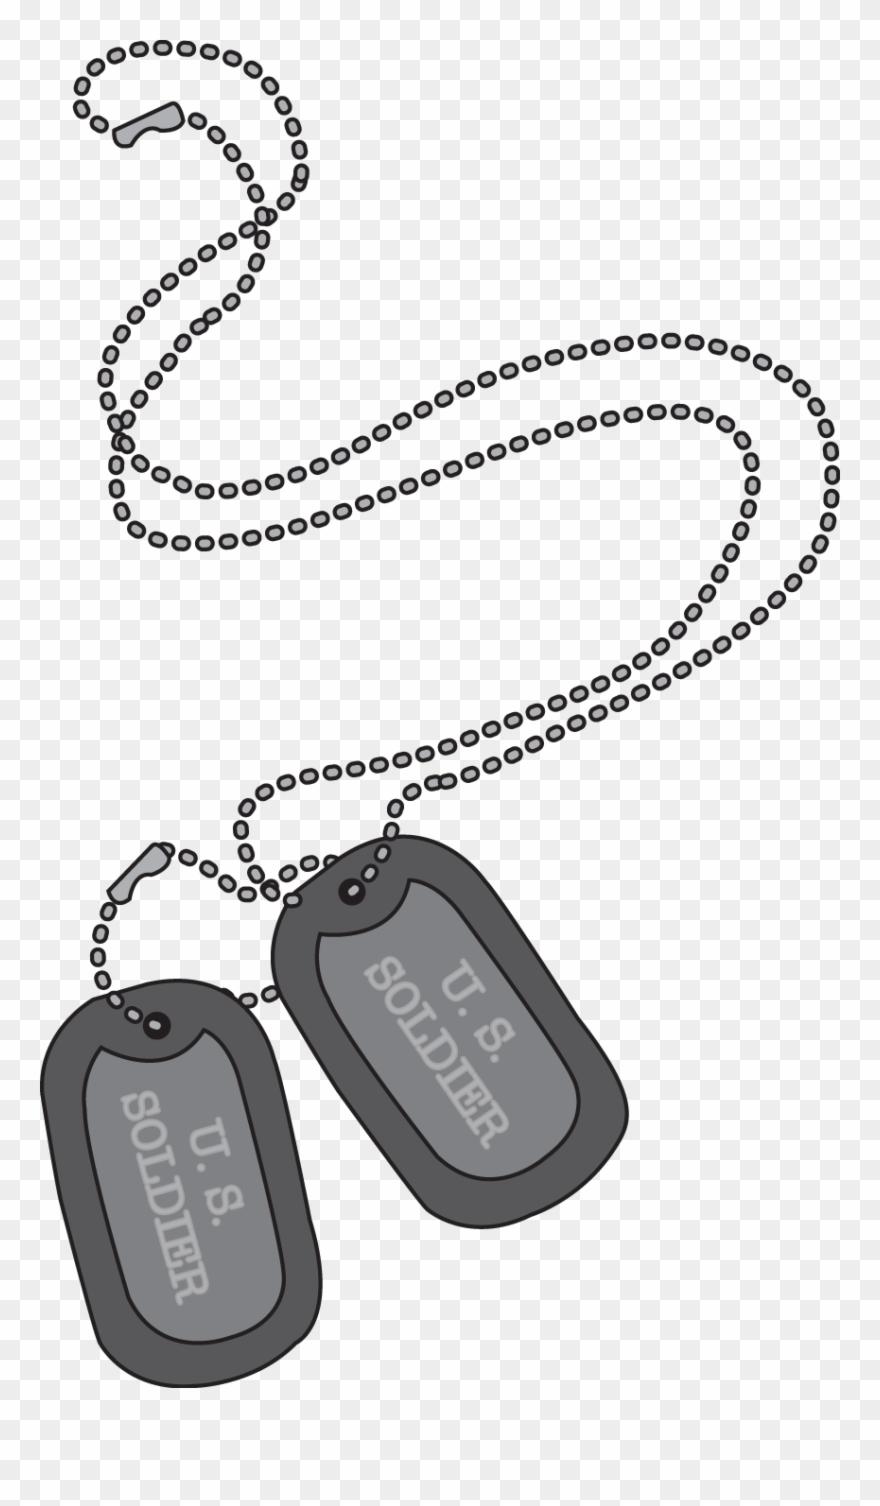 Army tags clipart jpg royalty free stock Photo By @daniellemoraesfalcao - Us Army Dog Tags Clipart - Png ... jpg royalty free stock